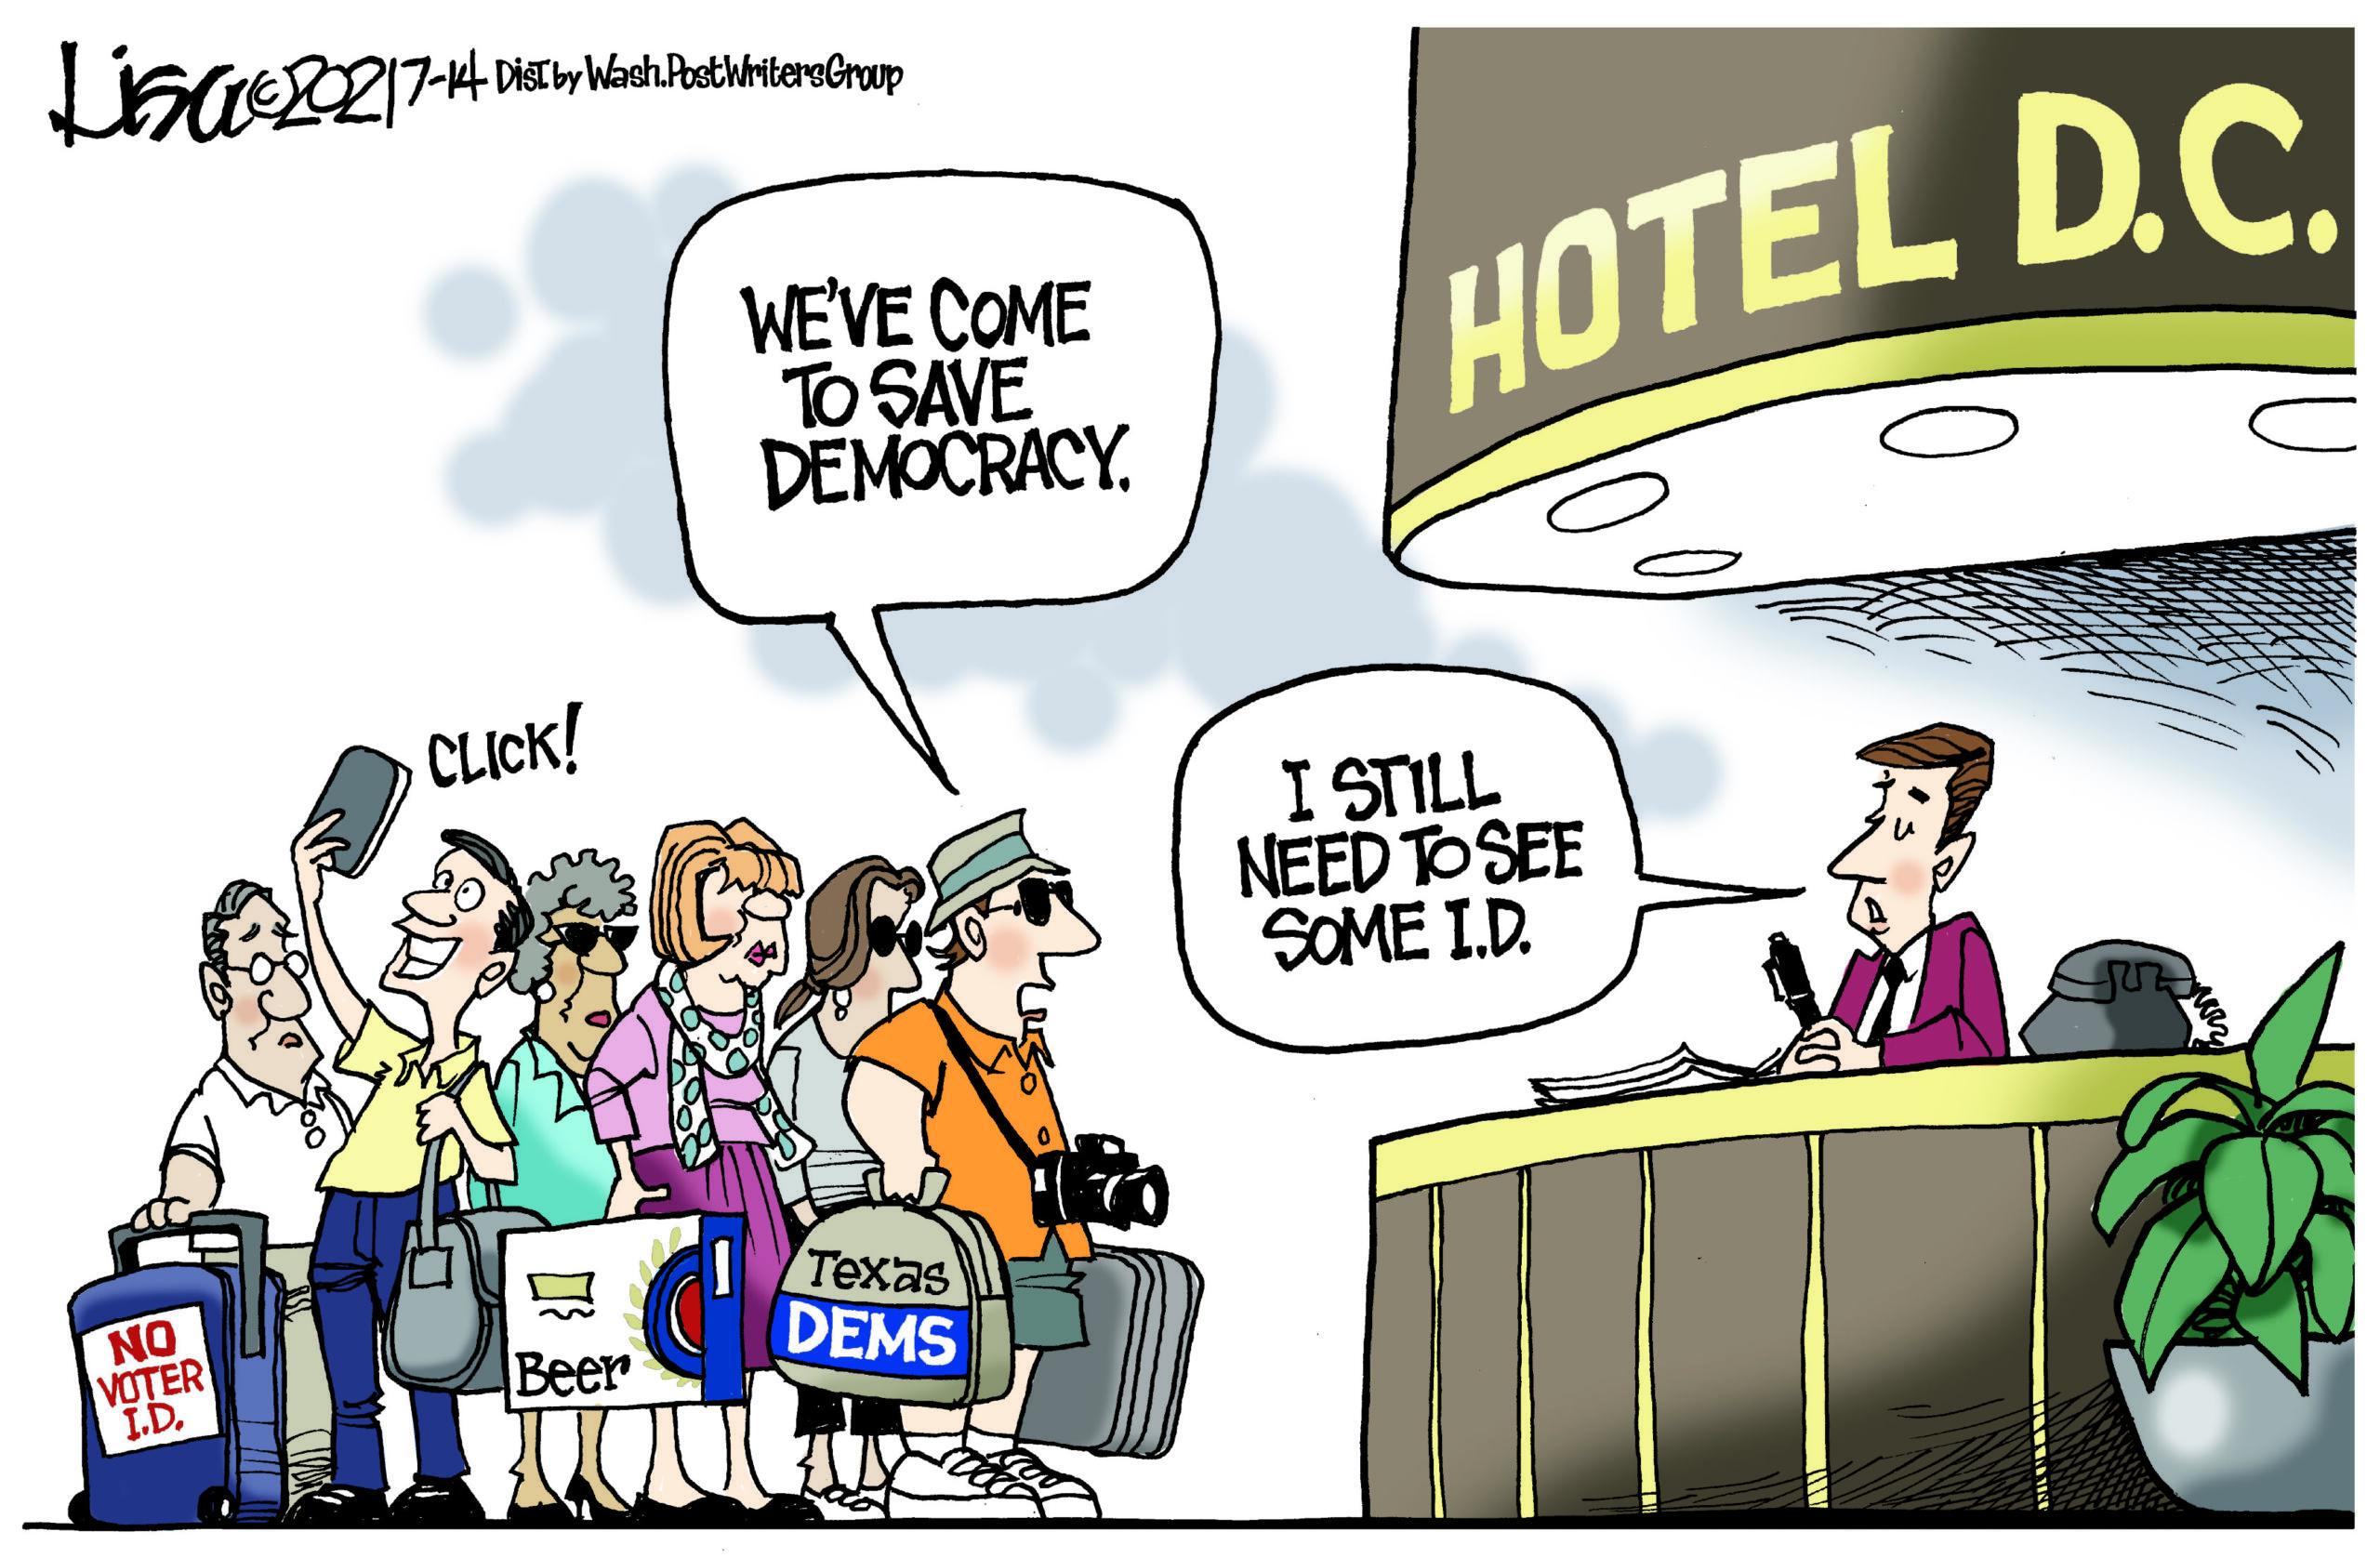 July 17: Democracy